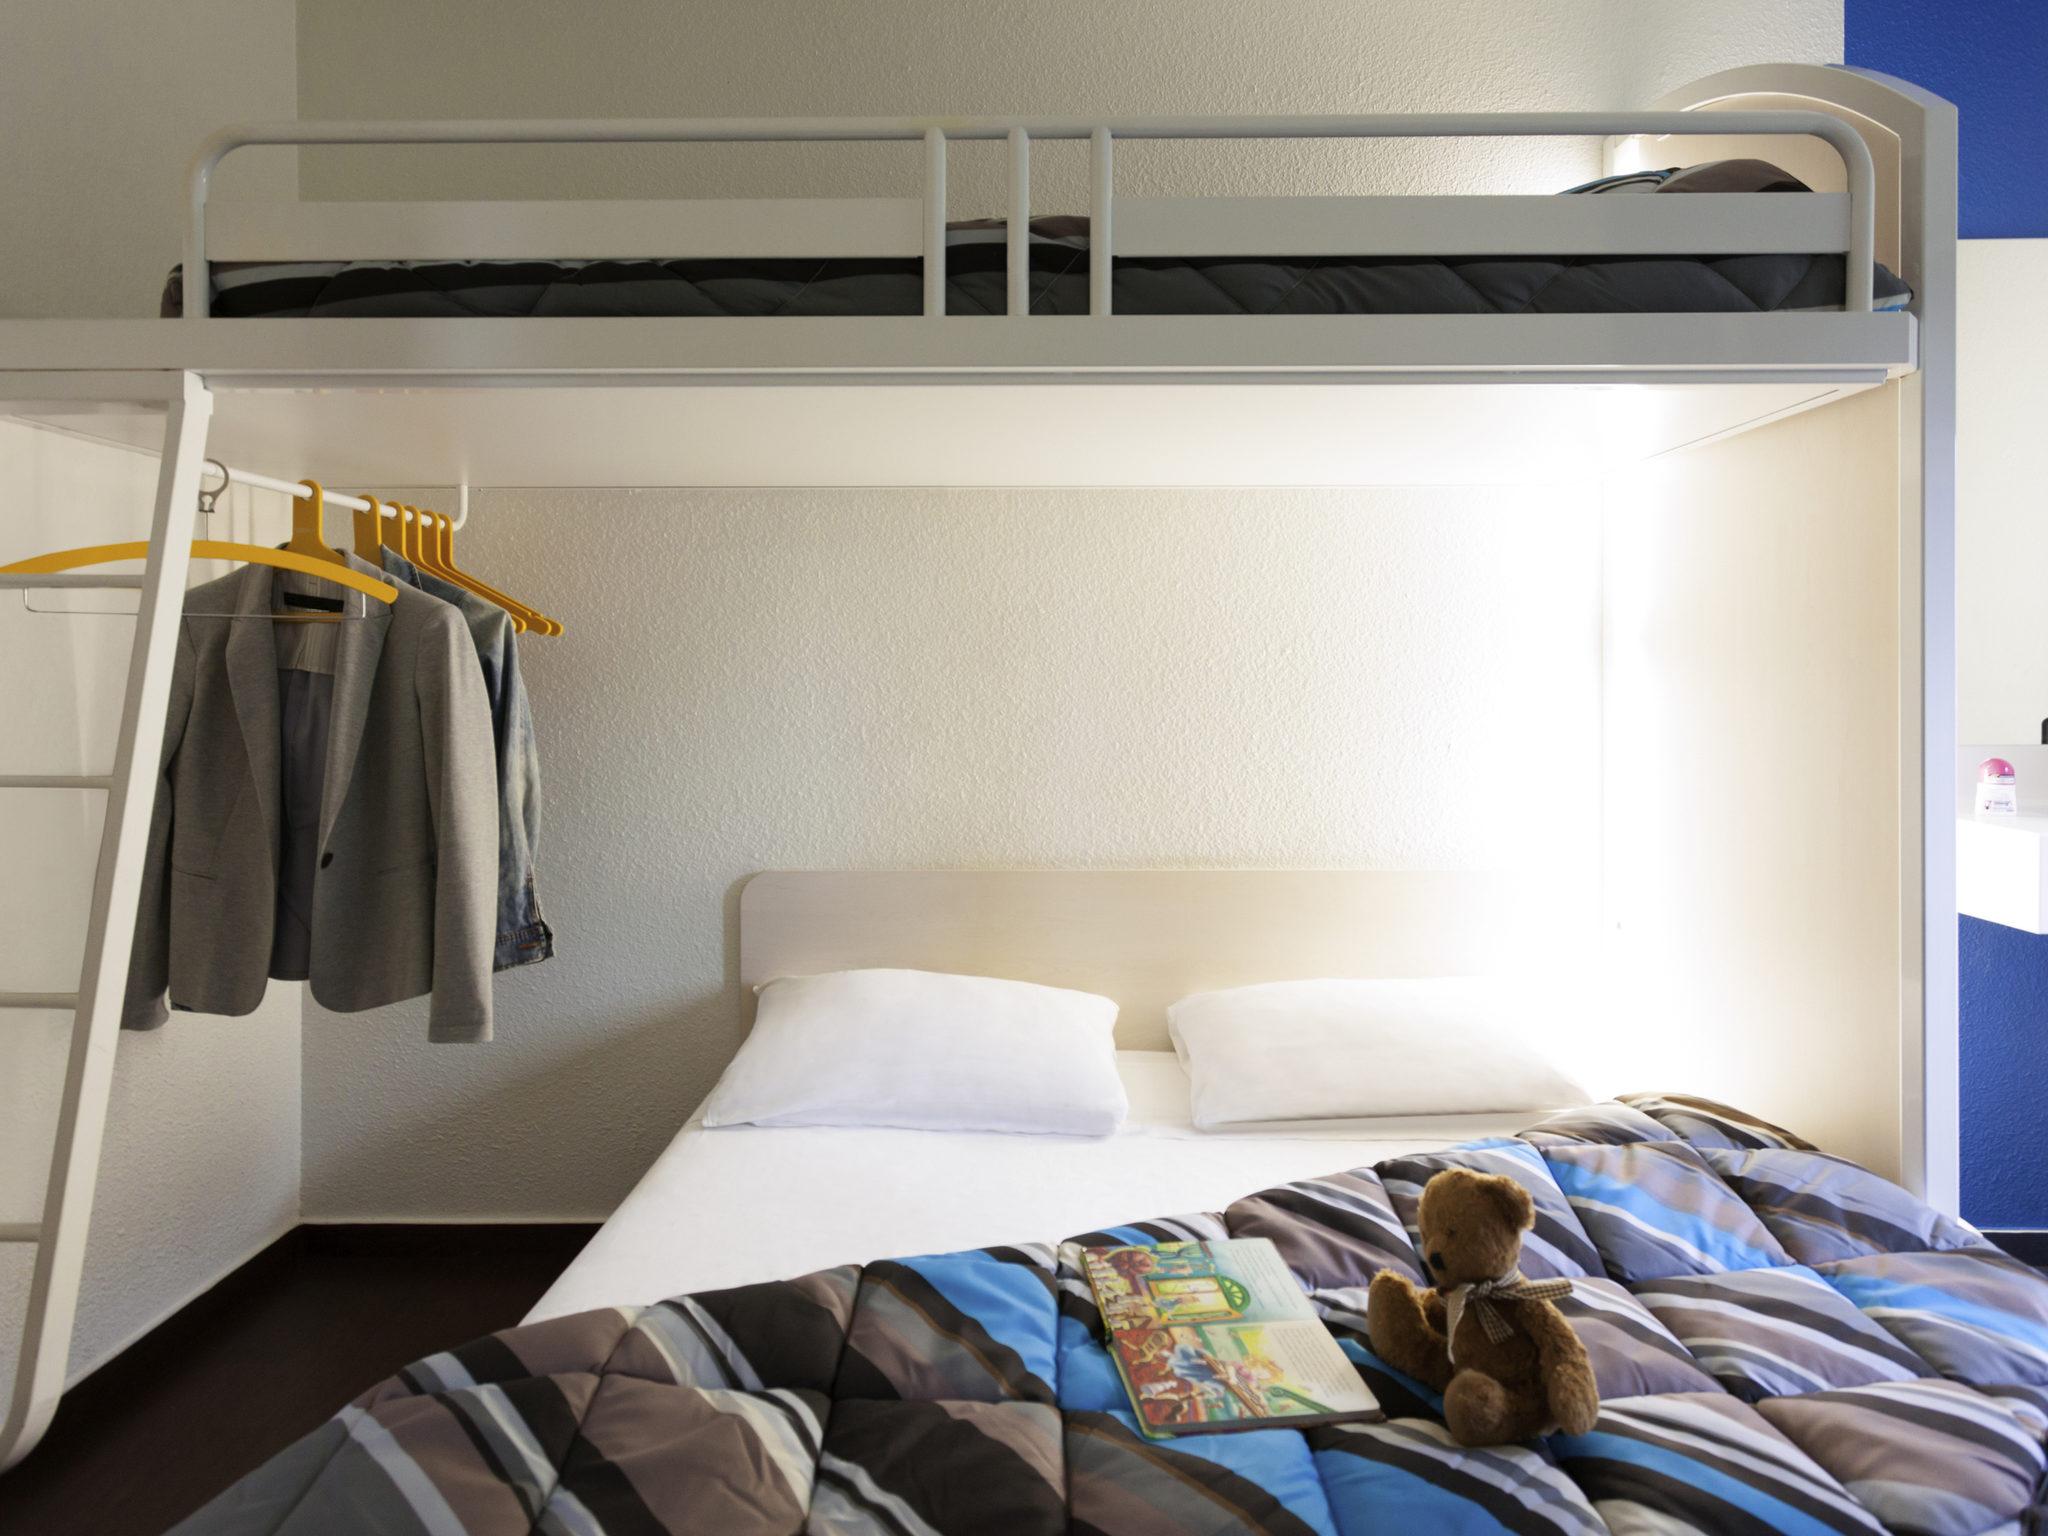 h tel brie comte robert hotelf1 brie comte robert. Black Bedroom Furniture Sets. Home Design Ideas